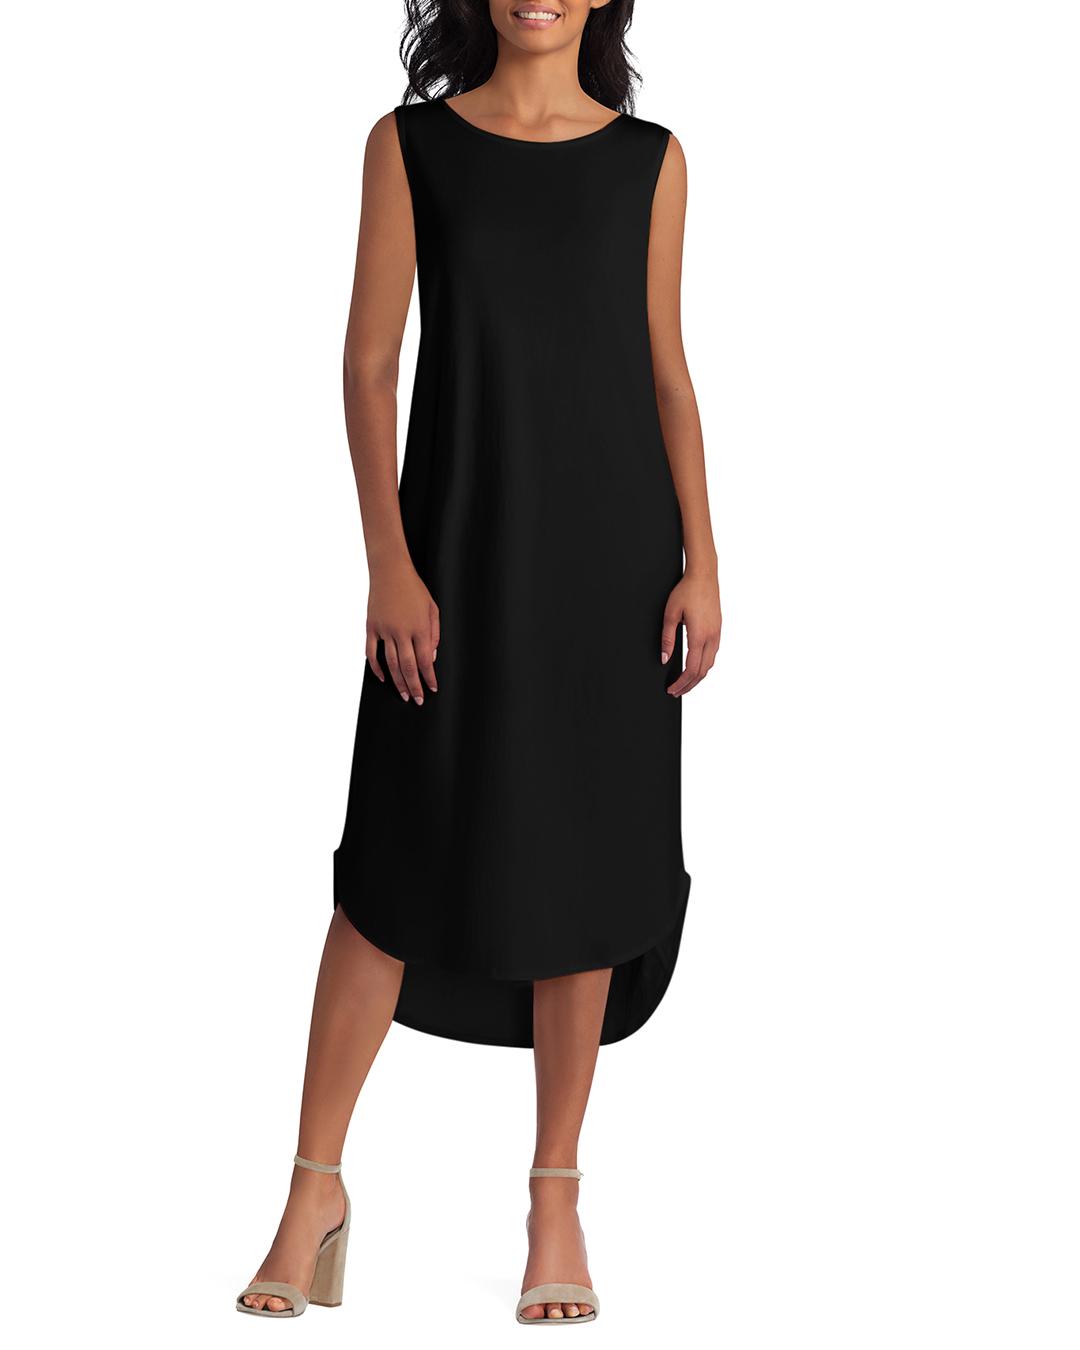 Halston Hi-Low Hem Knit Maxi Dress Hthr Flint Grey XXS NEW A274136